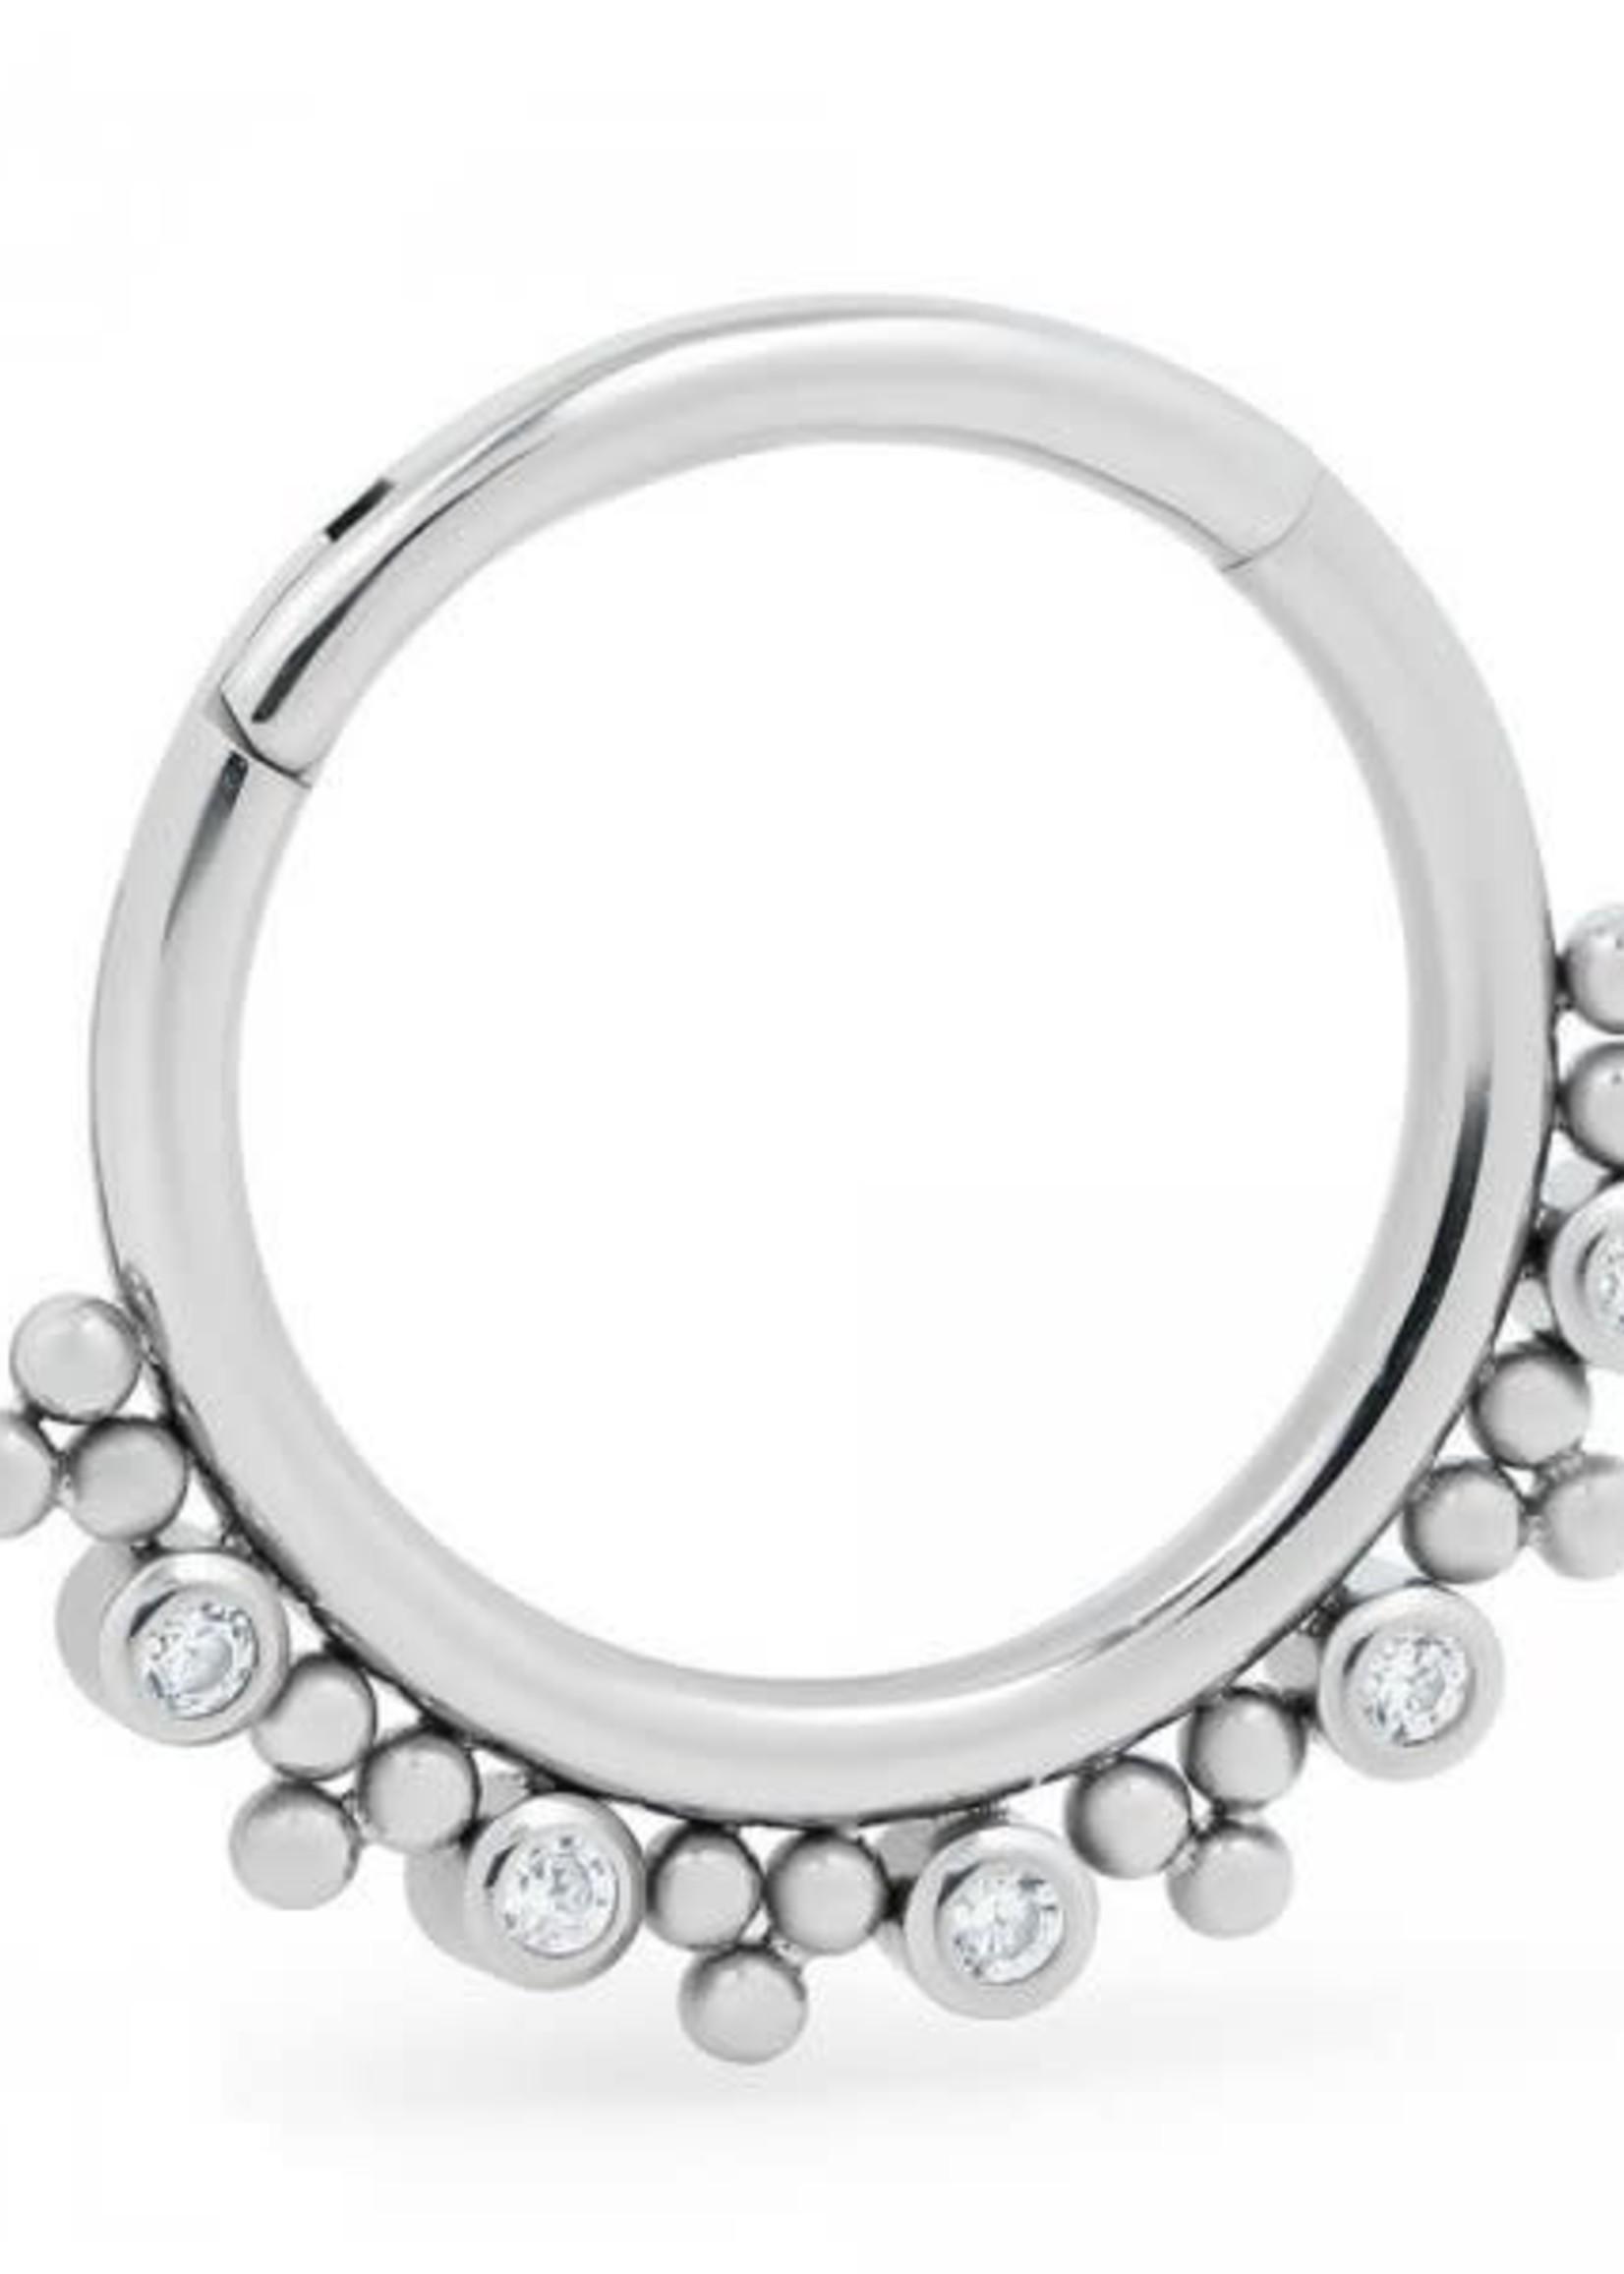 "16g 3/8"" Titanium CZ Beaded Enny Hinged Ring"